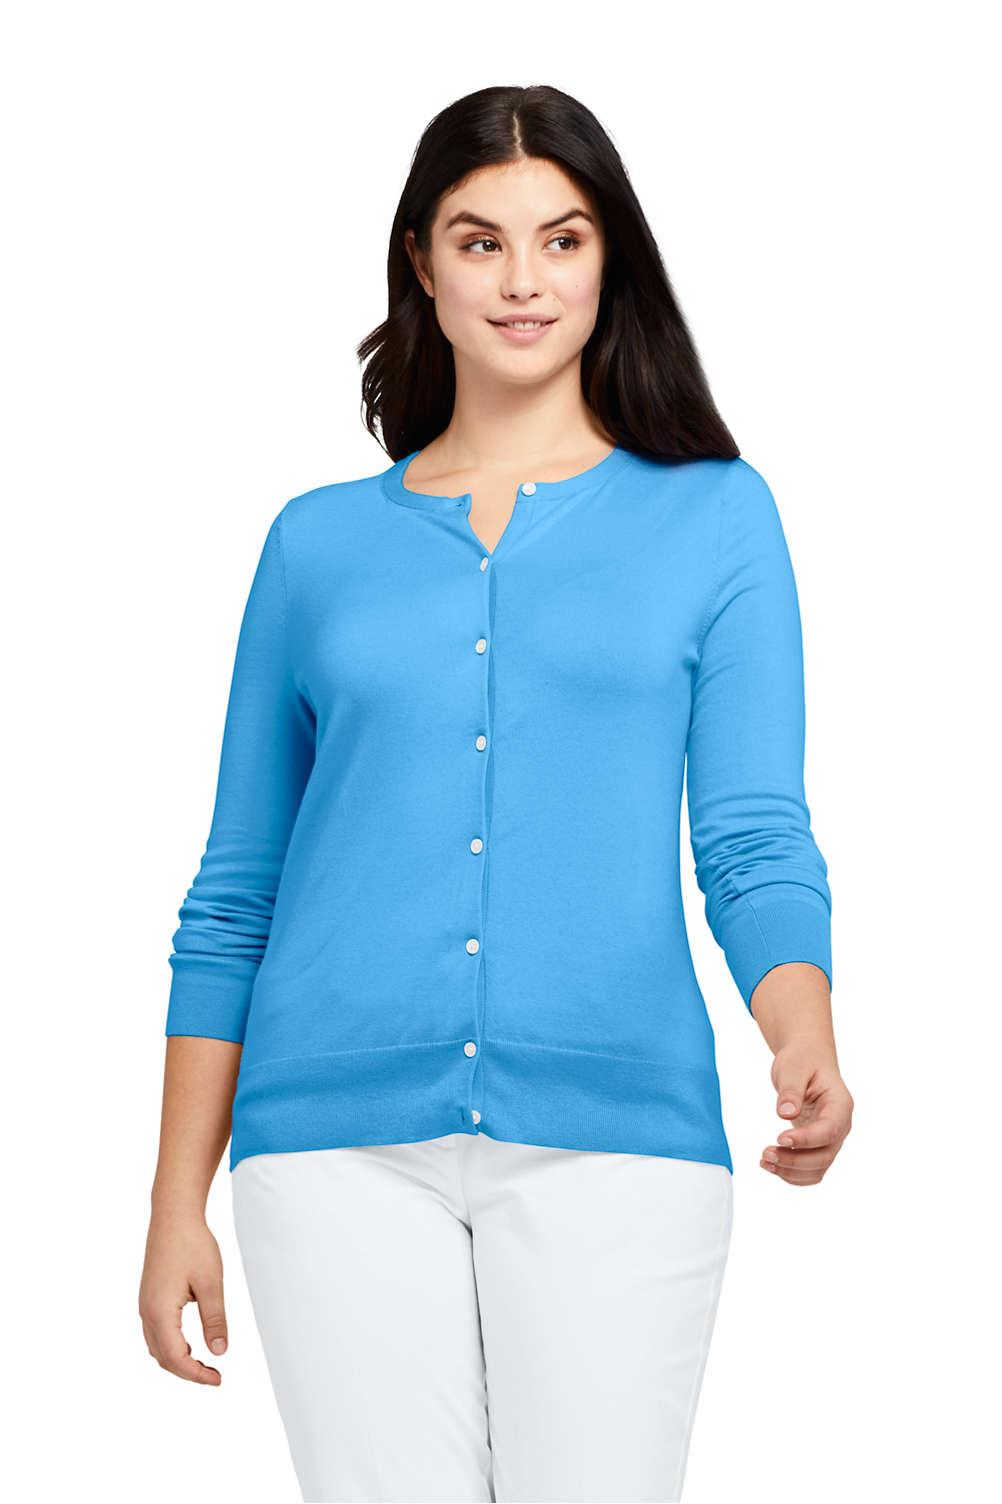 2657854c3d6 Women s Plus Size Supima Cotton Cardigan Sweater. Item  489025AH0. View  Fullscreen